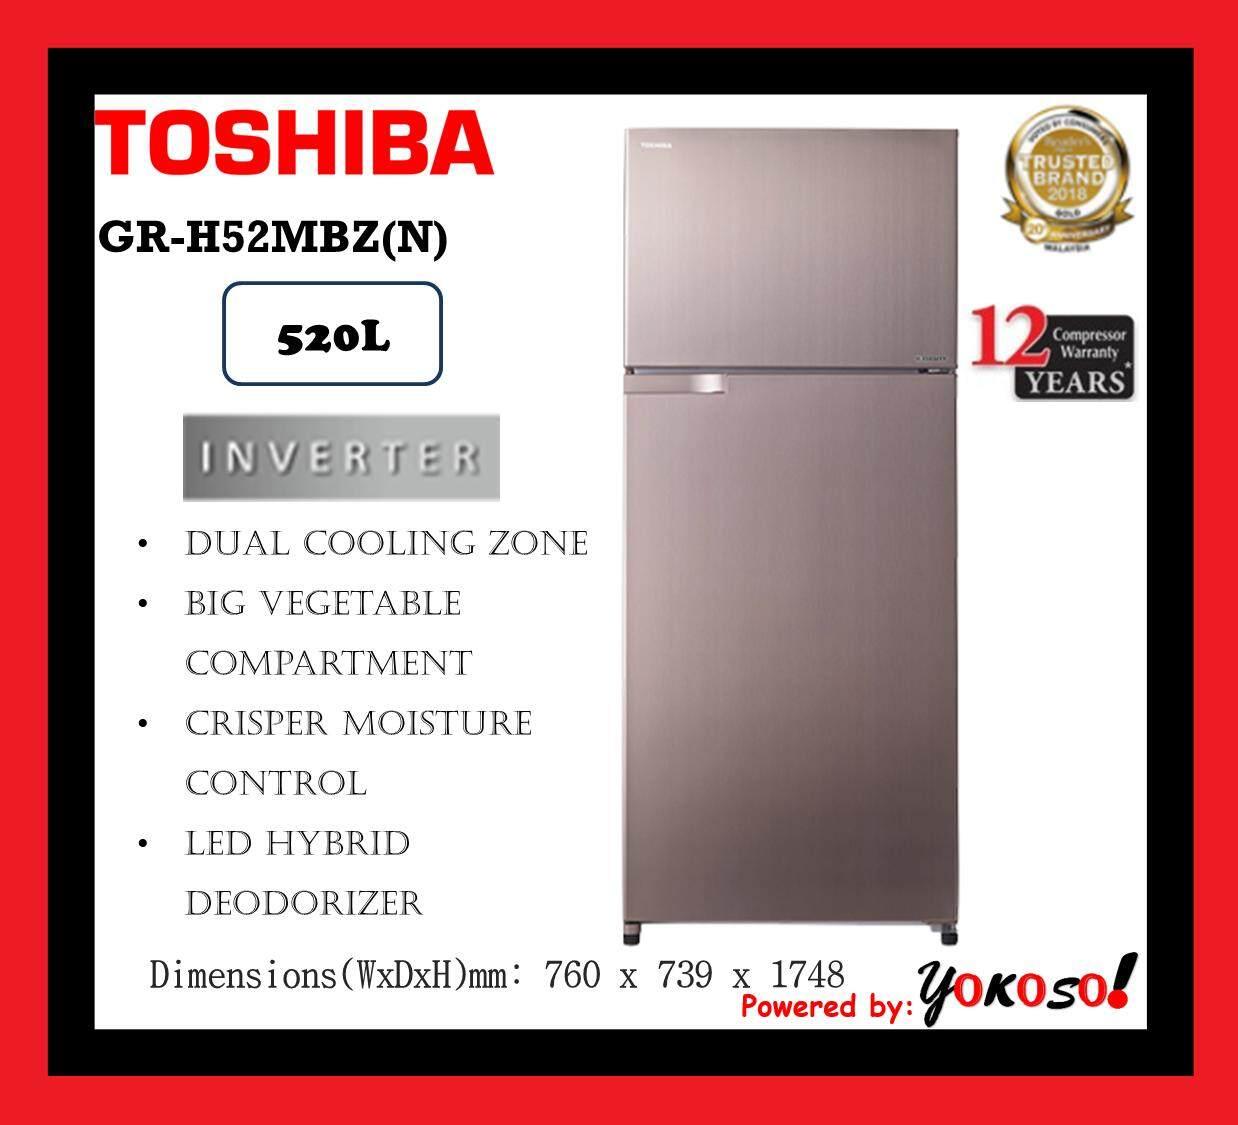 Toshiba GR-H52MBZ(N) 520L 2 Doors Inverter Fridge Refrigerator - Hybrid Bio Deodorizer